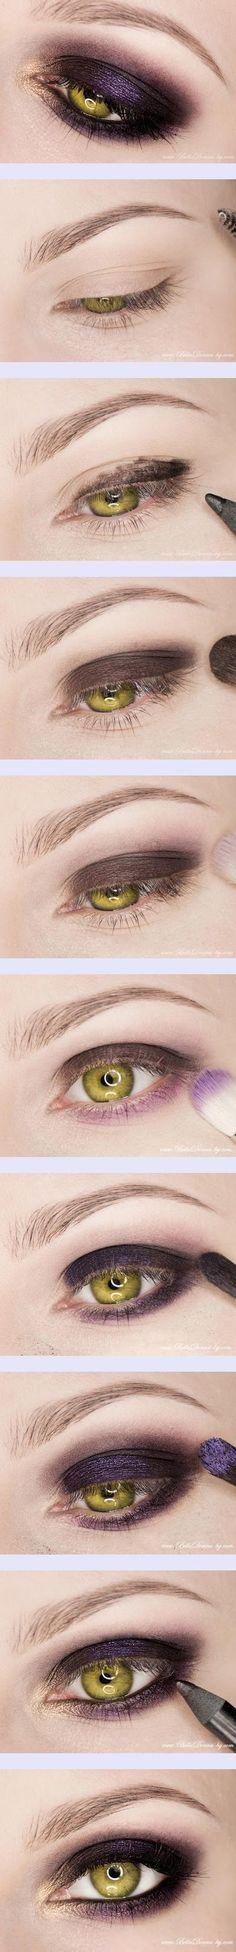 Pinspire - Paso a paso maquillaje morado Eye Makeup, Kiss Makeup, Makeup Tips, Hair Makeup, Makeup Tutorials, All Things Beauty, Beauty Make Up, Hair Beauty, Ruby Woo